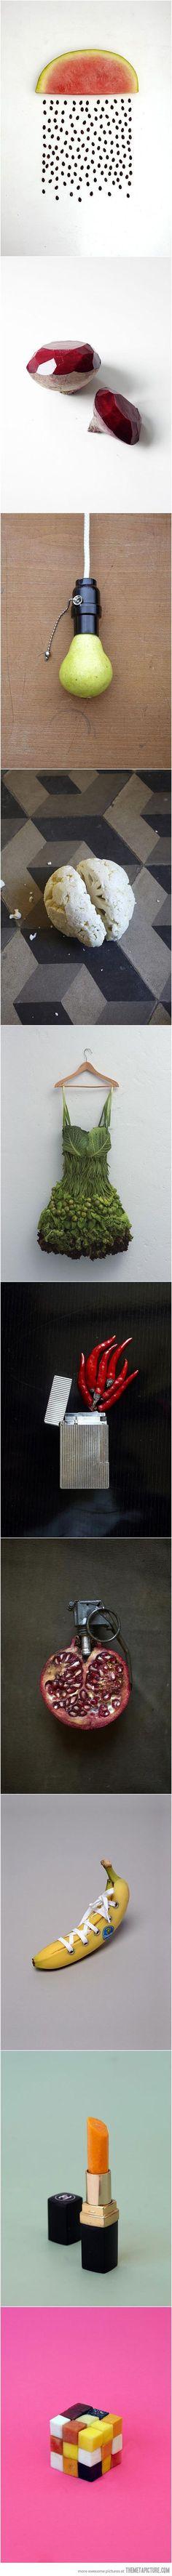 Creative food art... brilliant ideas and execution!